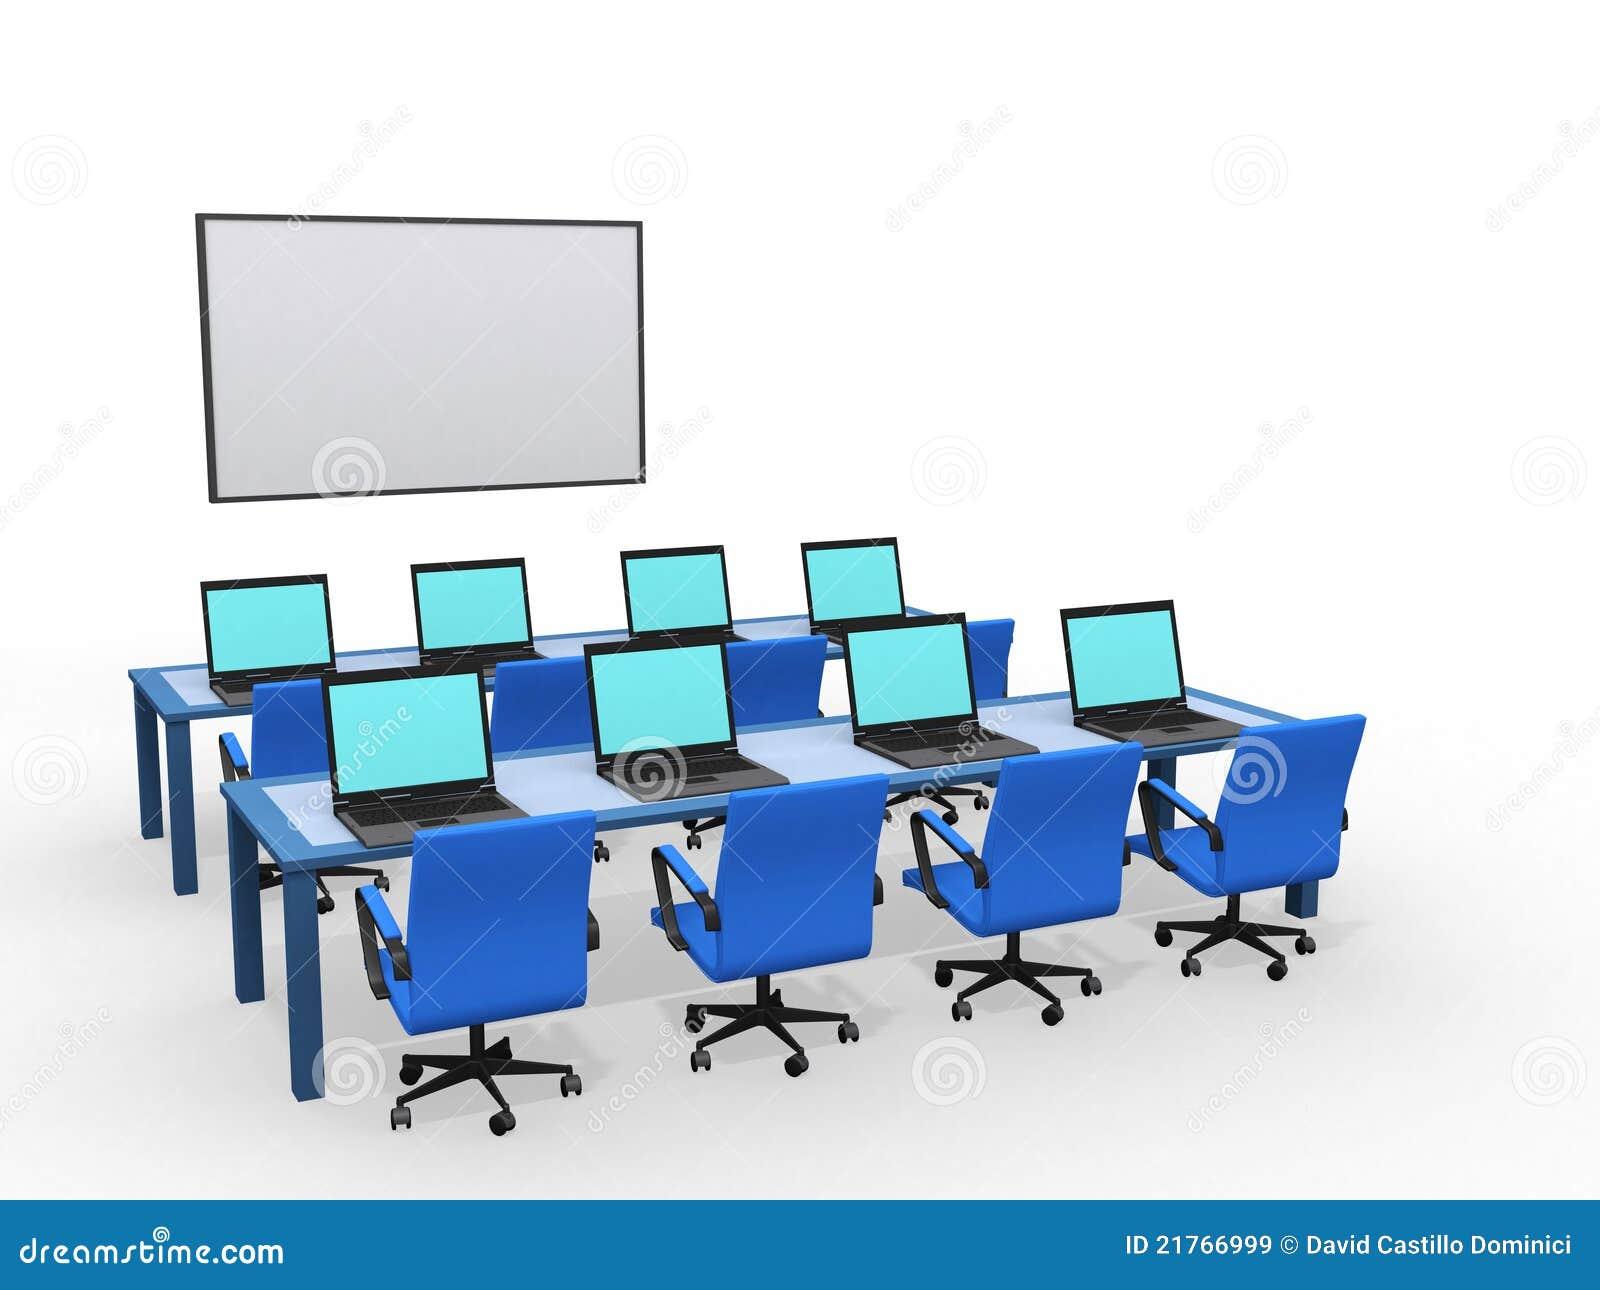 Modern Classroom Model : Stock images by david castillo dominici photos